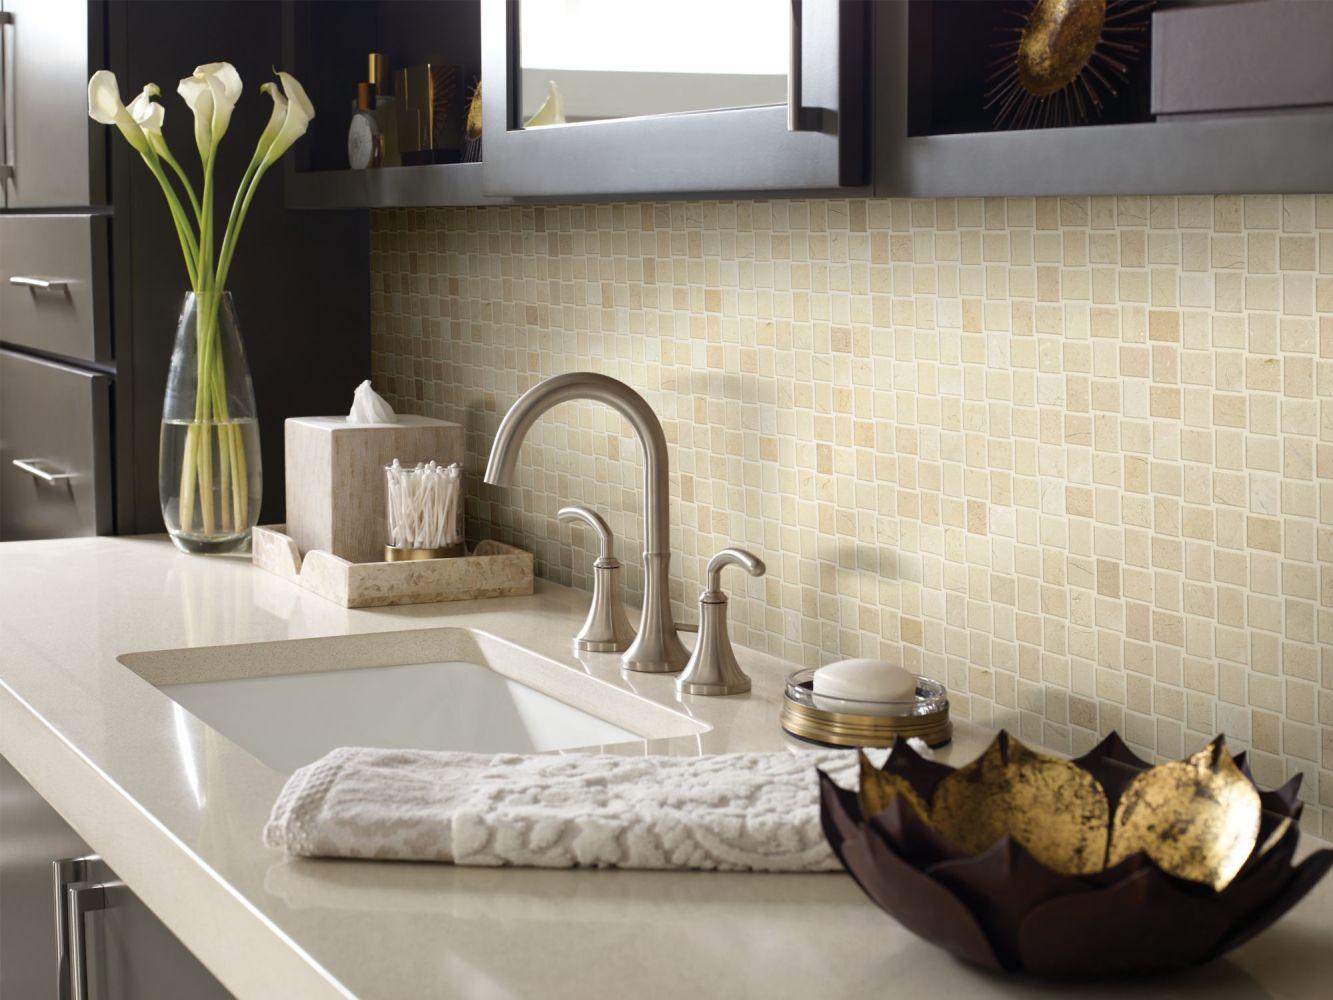 Shaw Floors Toll Brothers Ceramics Estate  Basketweave Mo Crema Marfil 00200_TL86B